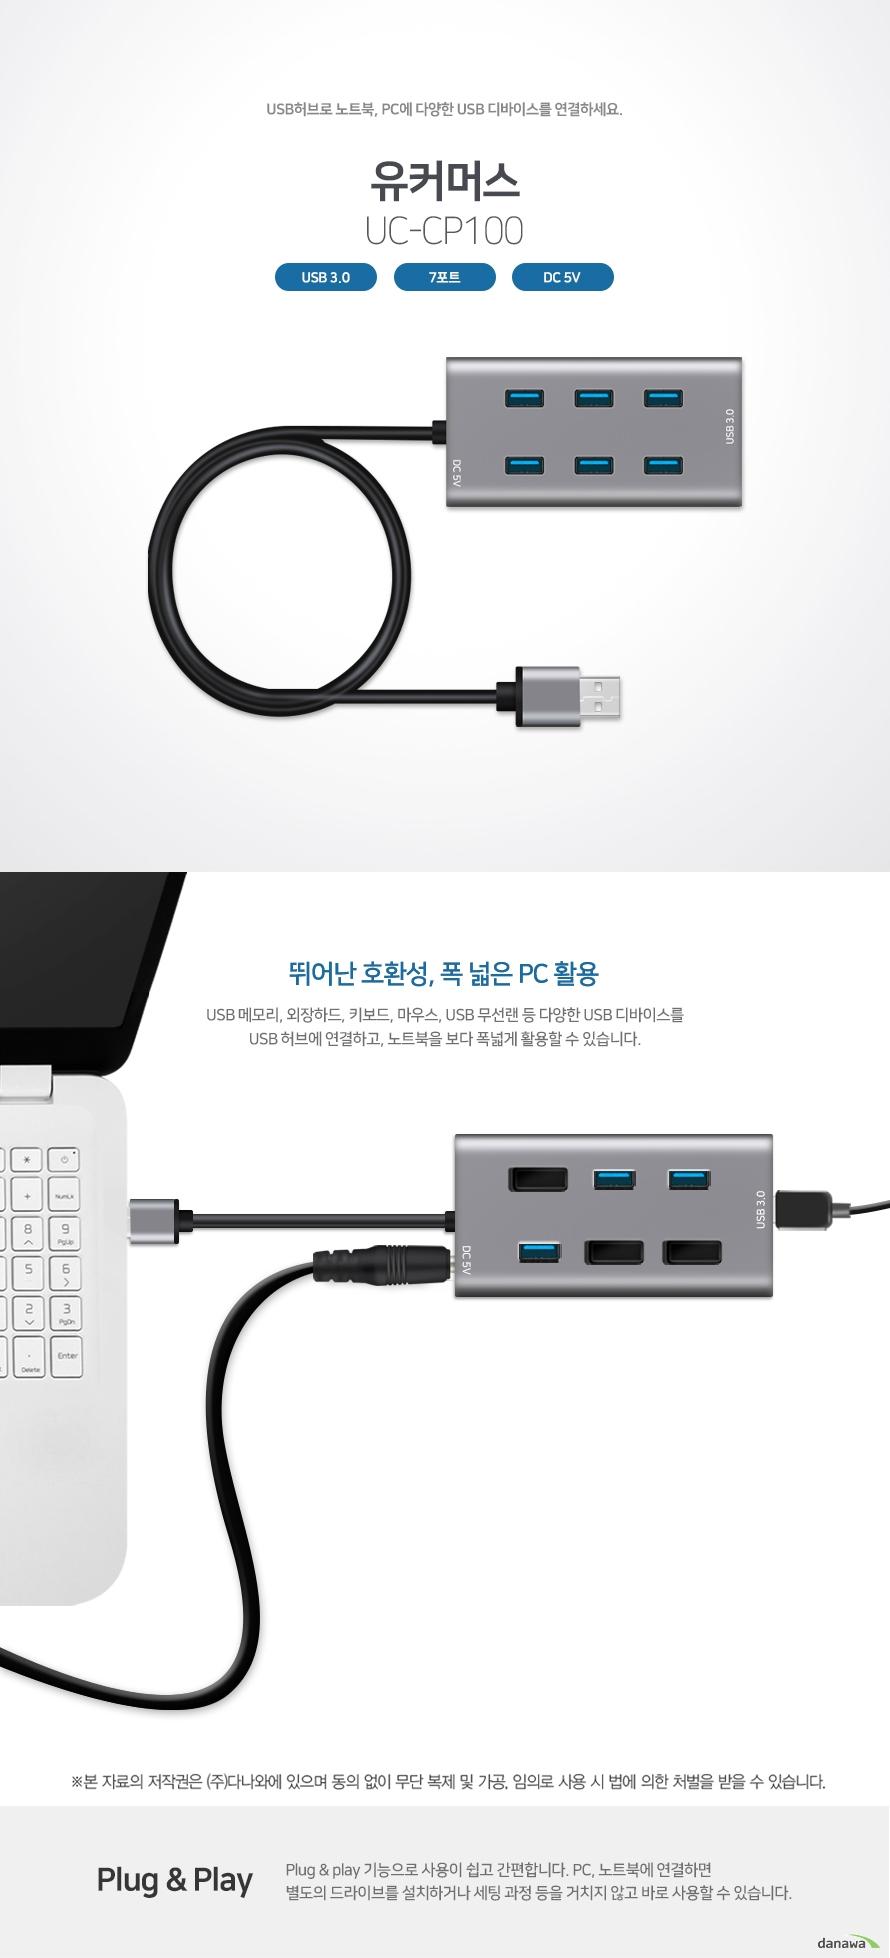 USB 허브로 노트북, PC에 다양한 USB 디바이스를 연결하세요 유커머스 UC-CP100 USB 3.0 / 7포트 / DC 5V 뛰어난 호환성, 폭 넒은 PC 활용 USB 메모리, 외장하드, 키보드, 마우스, USB 무선랜 등 다양한 USB 디바이스를 USB 허브에 연결하고, 노트북을 보다 폭넓게 활용할 수 있습니다. Plug & play 기능으로 사용이 쉽고 간편합니다. PC, 노트북에 연결하면 별도의 드라이브를 설치하거나 세팅 과정 등을 거치지 않고 바로 사용할 수 있습니다.